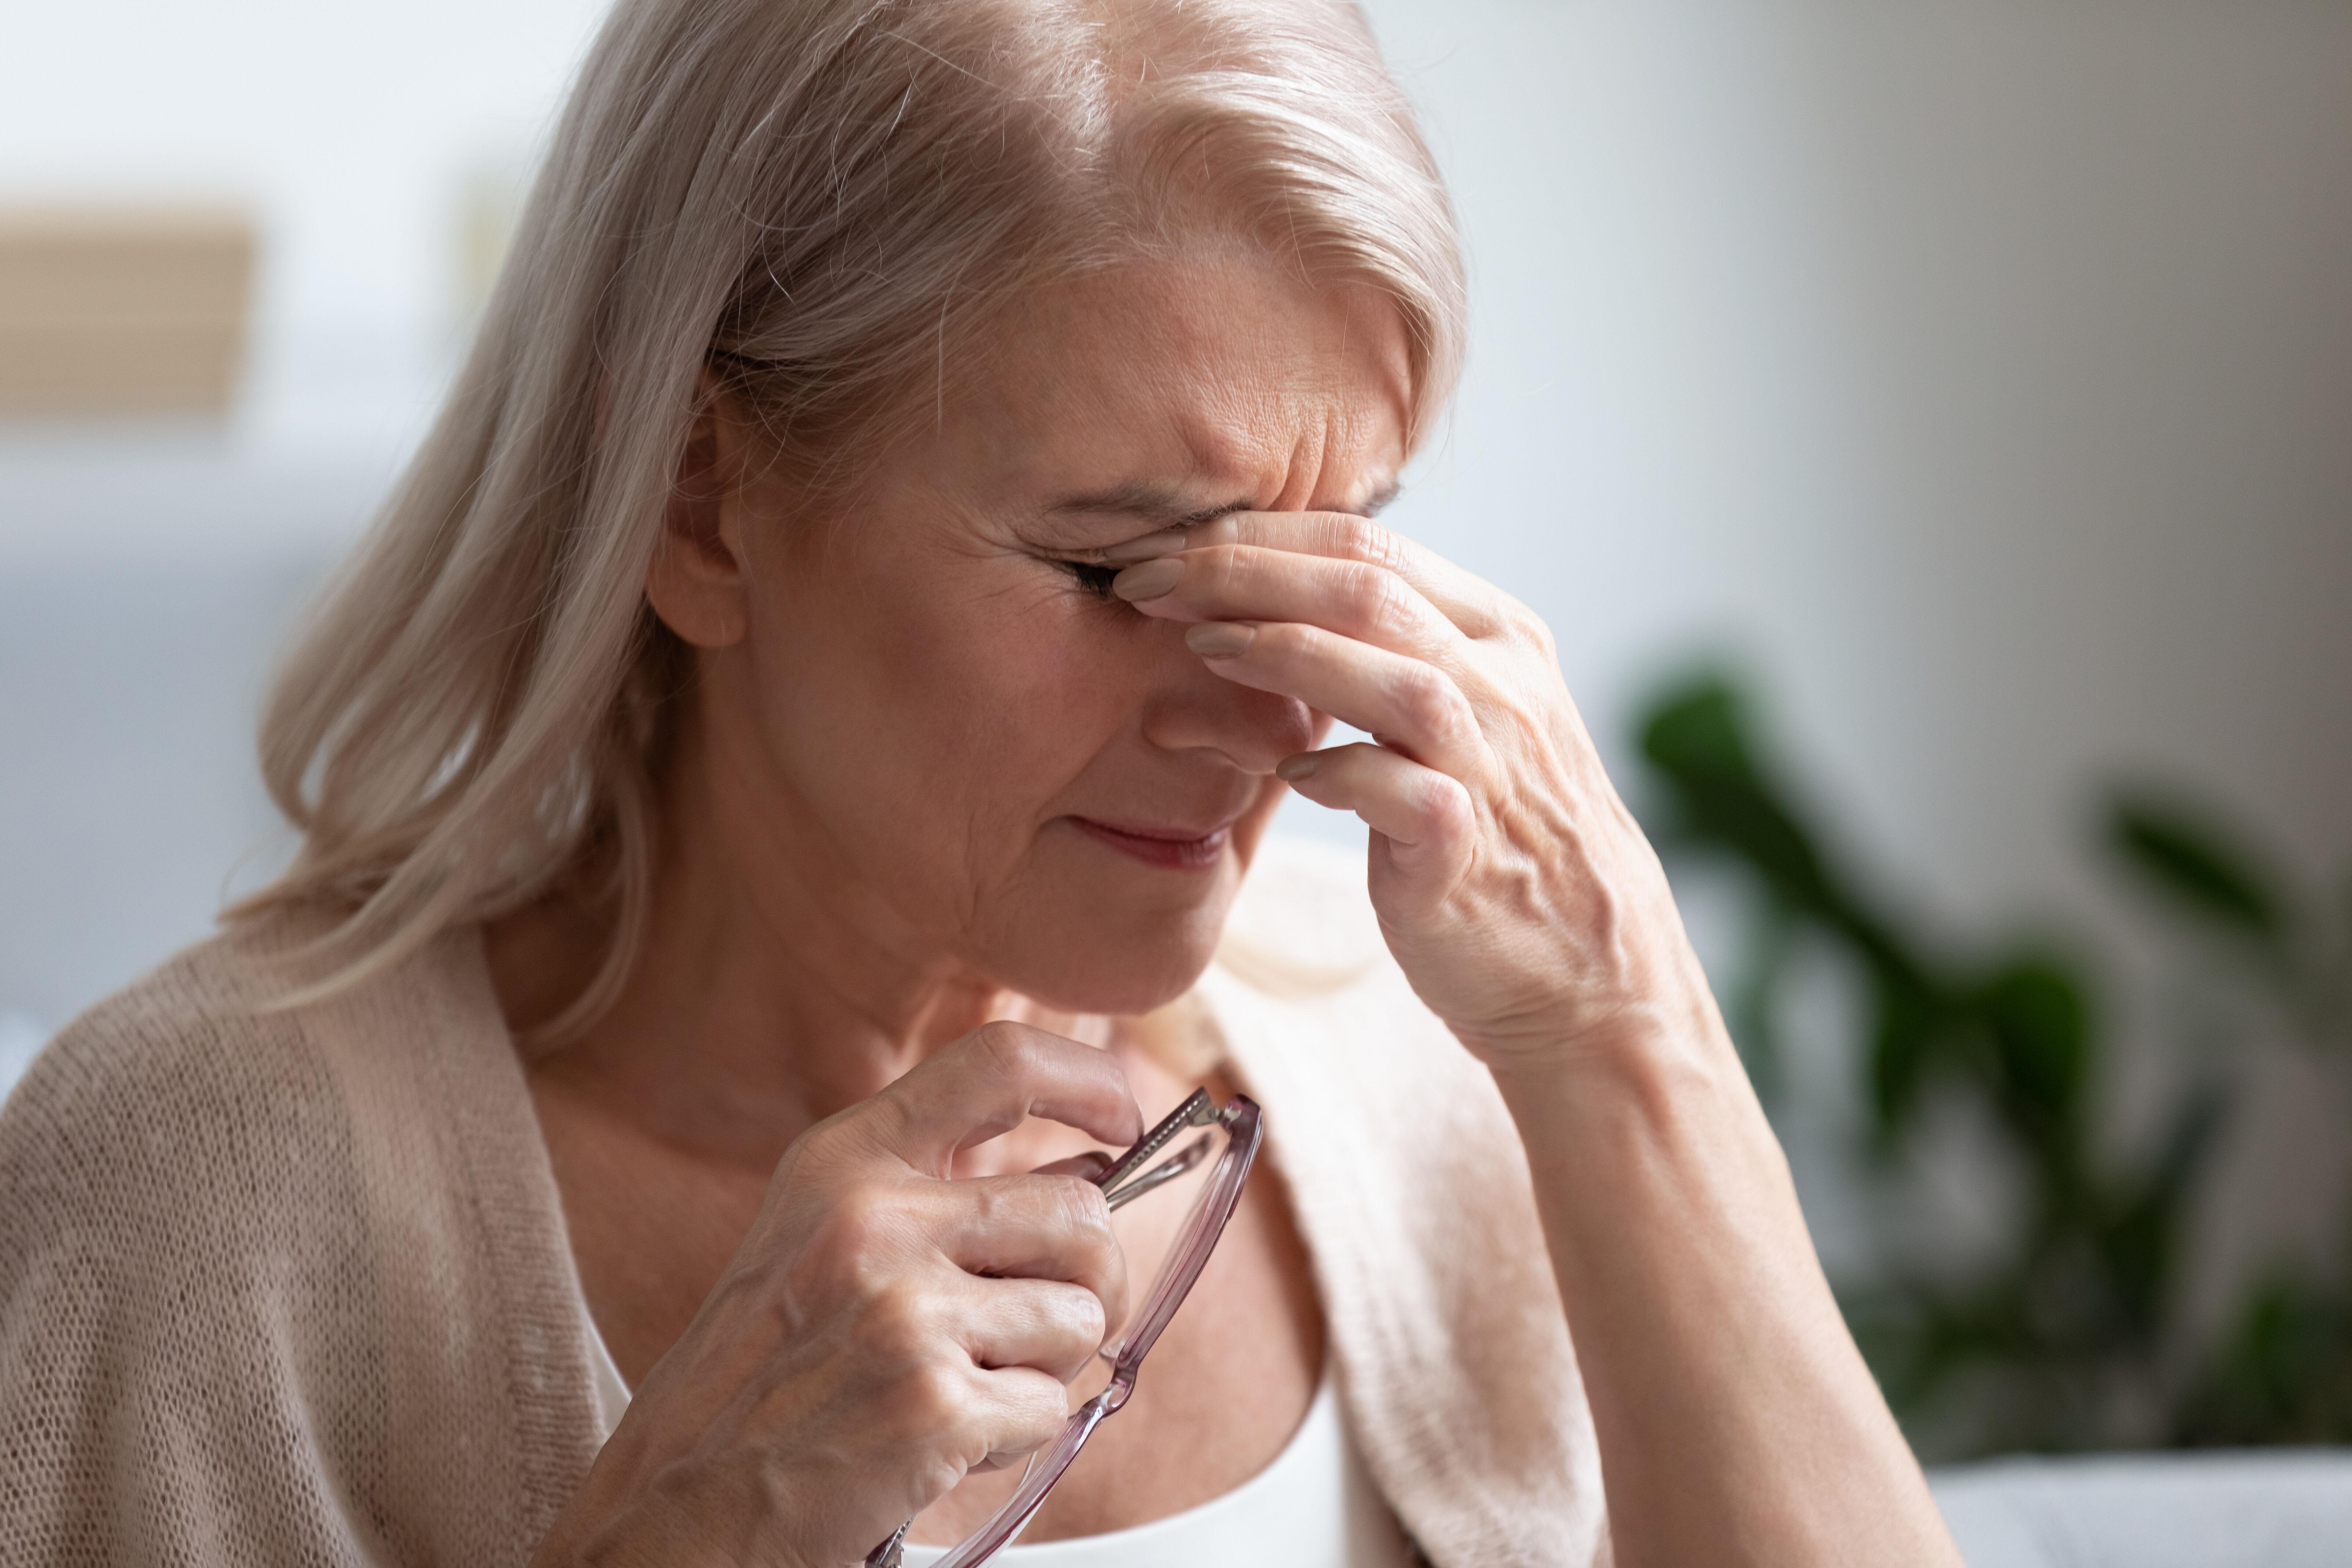 Woman rubs tired eyes